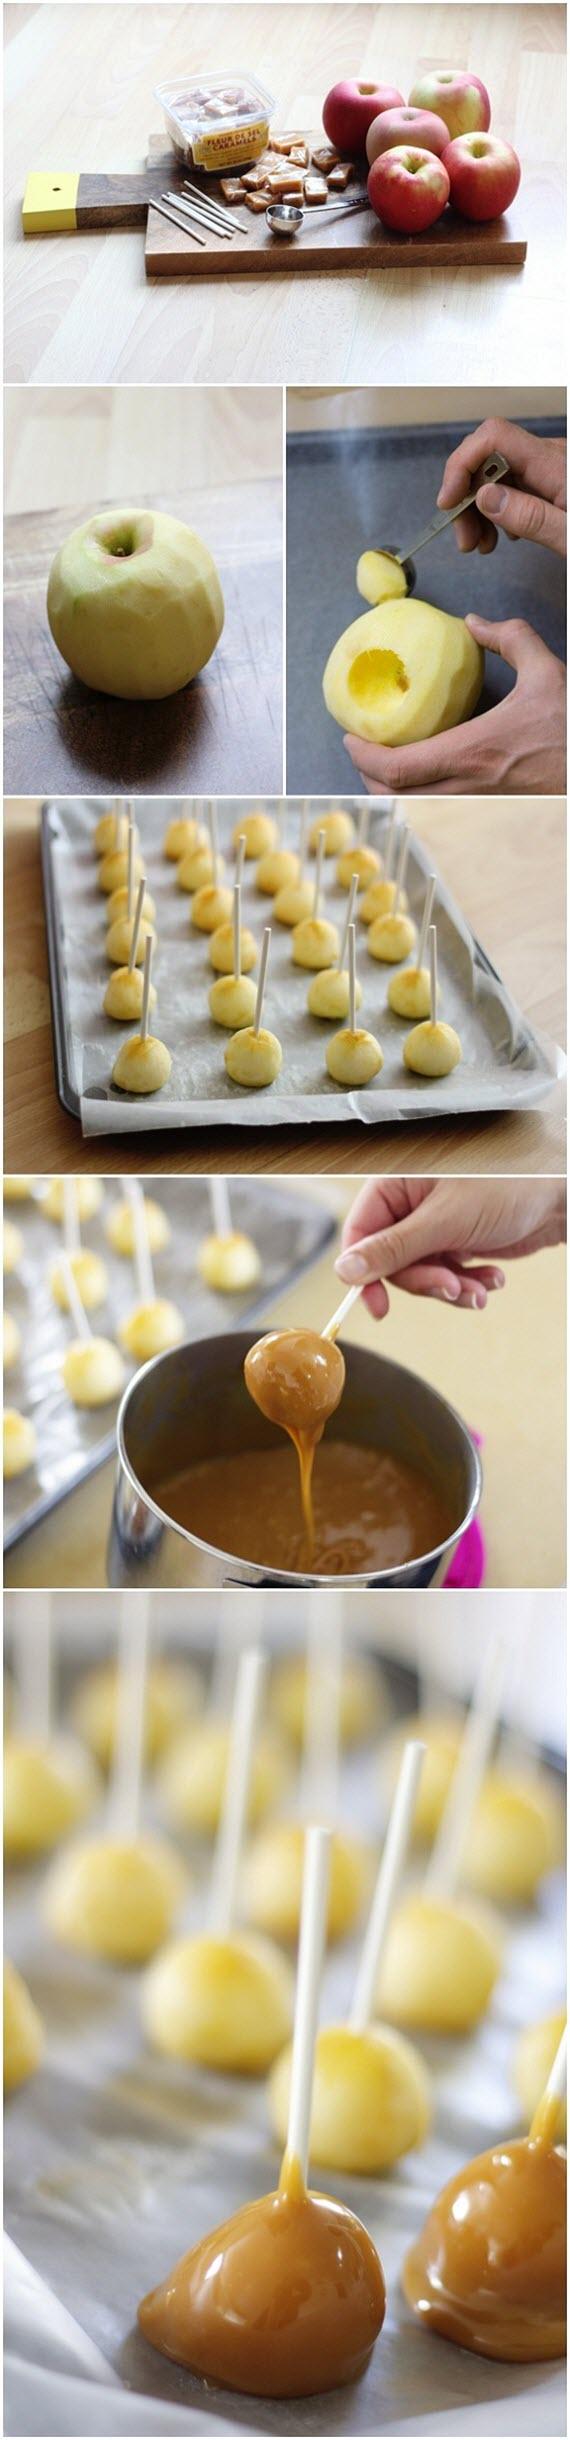 DIY mini carmel apples // halloween ideas #apples